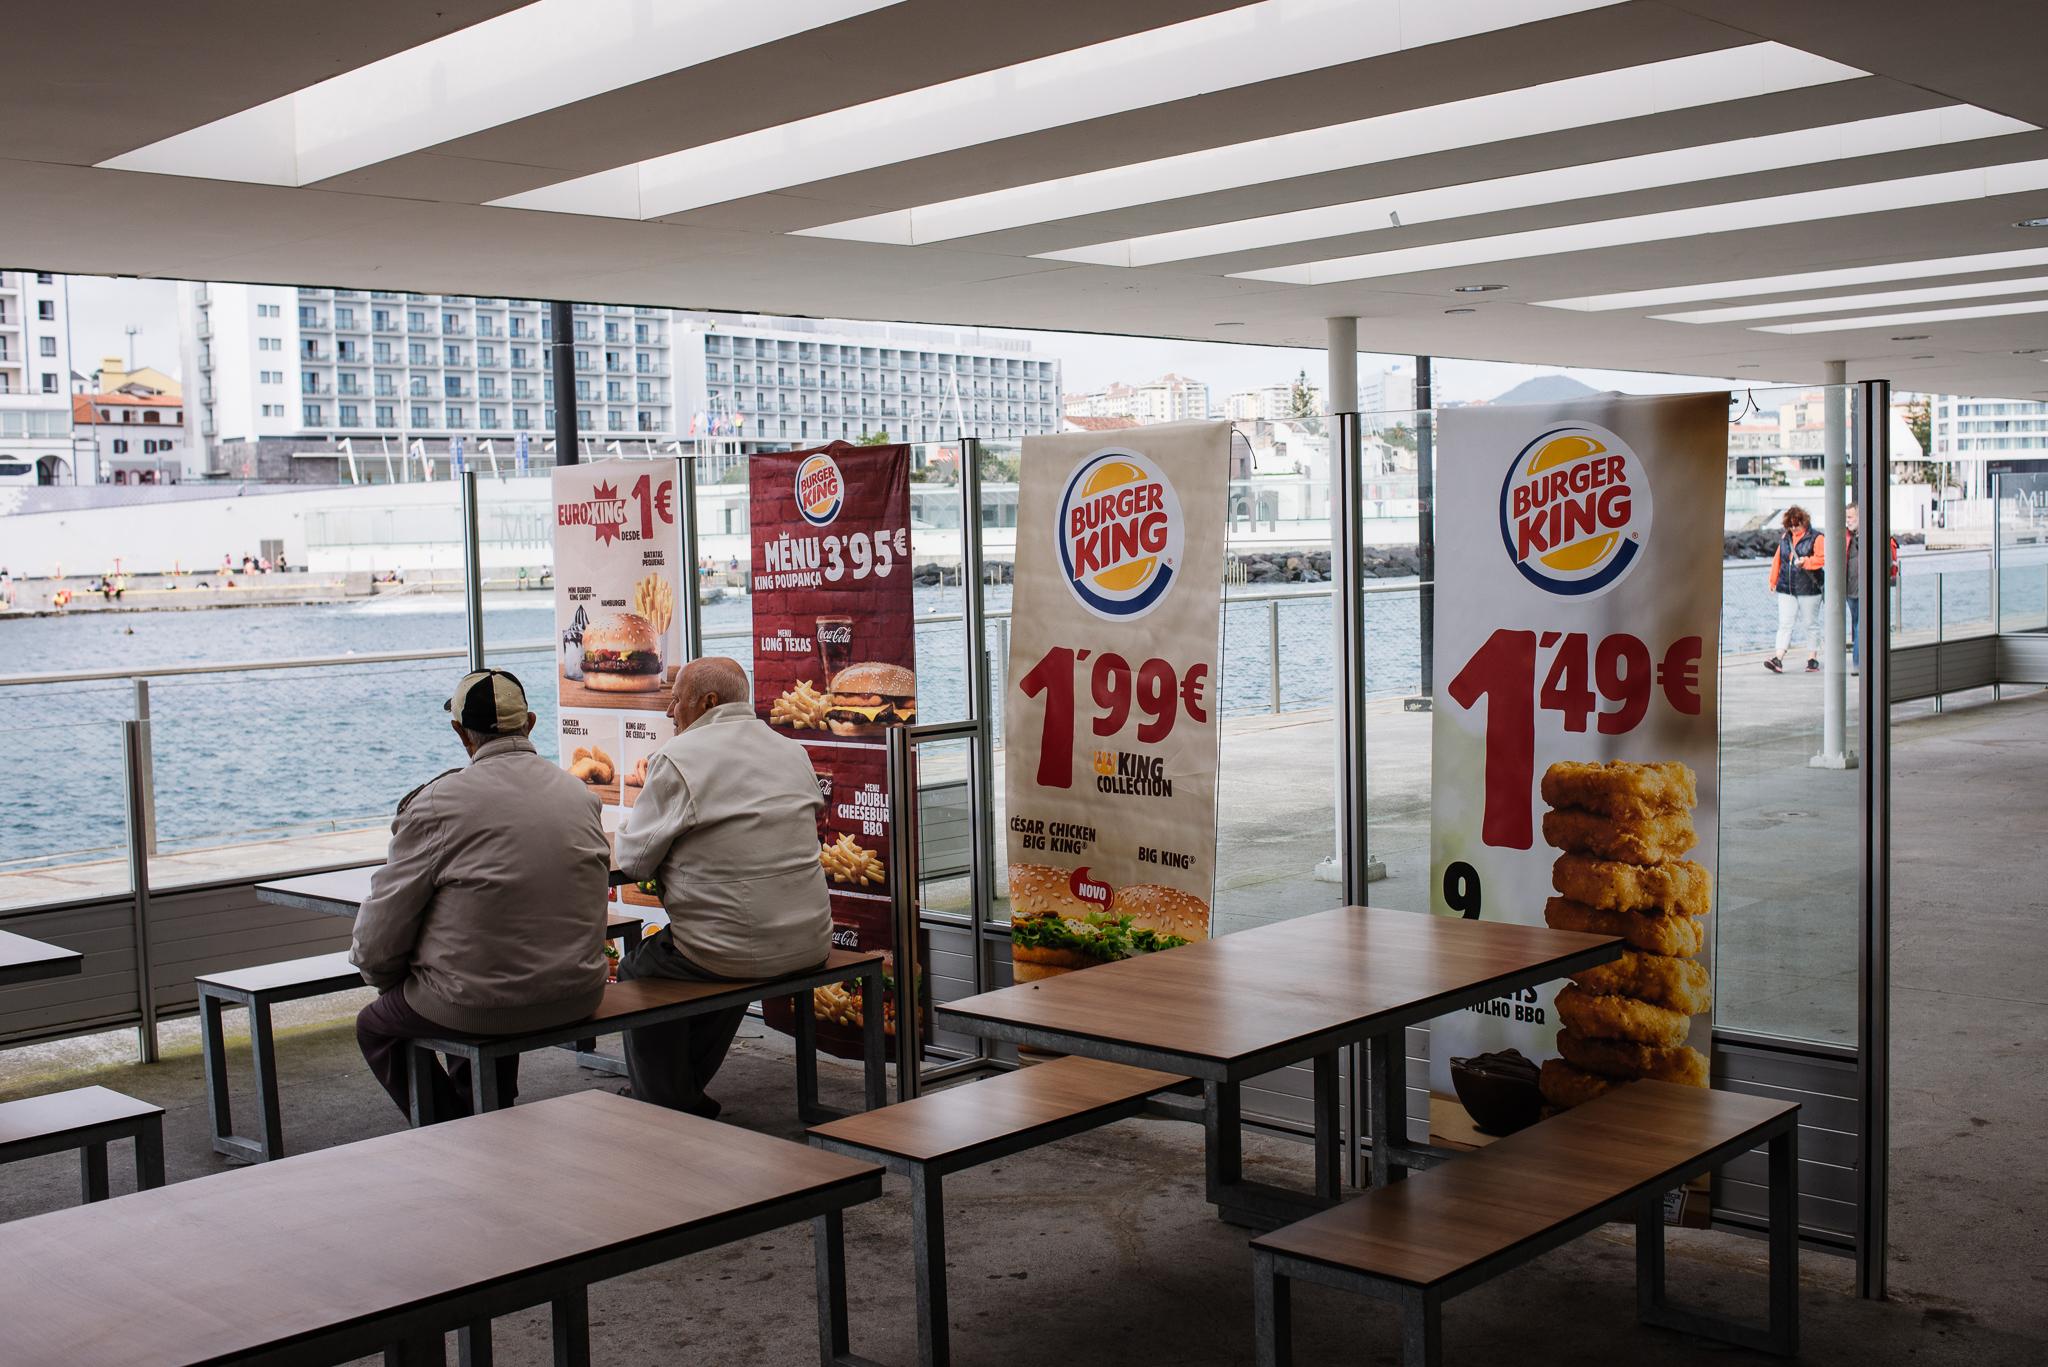 Burger King Sao Miguelben az Azori-szigeteken